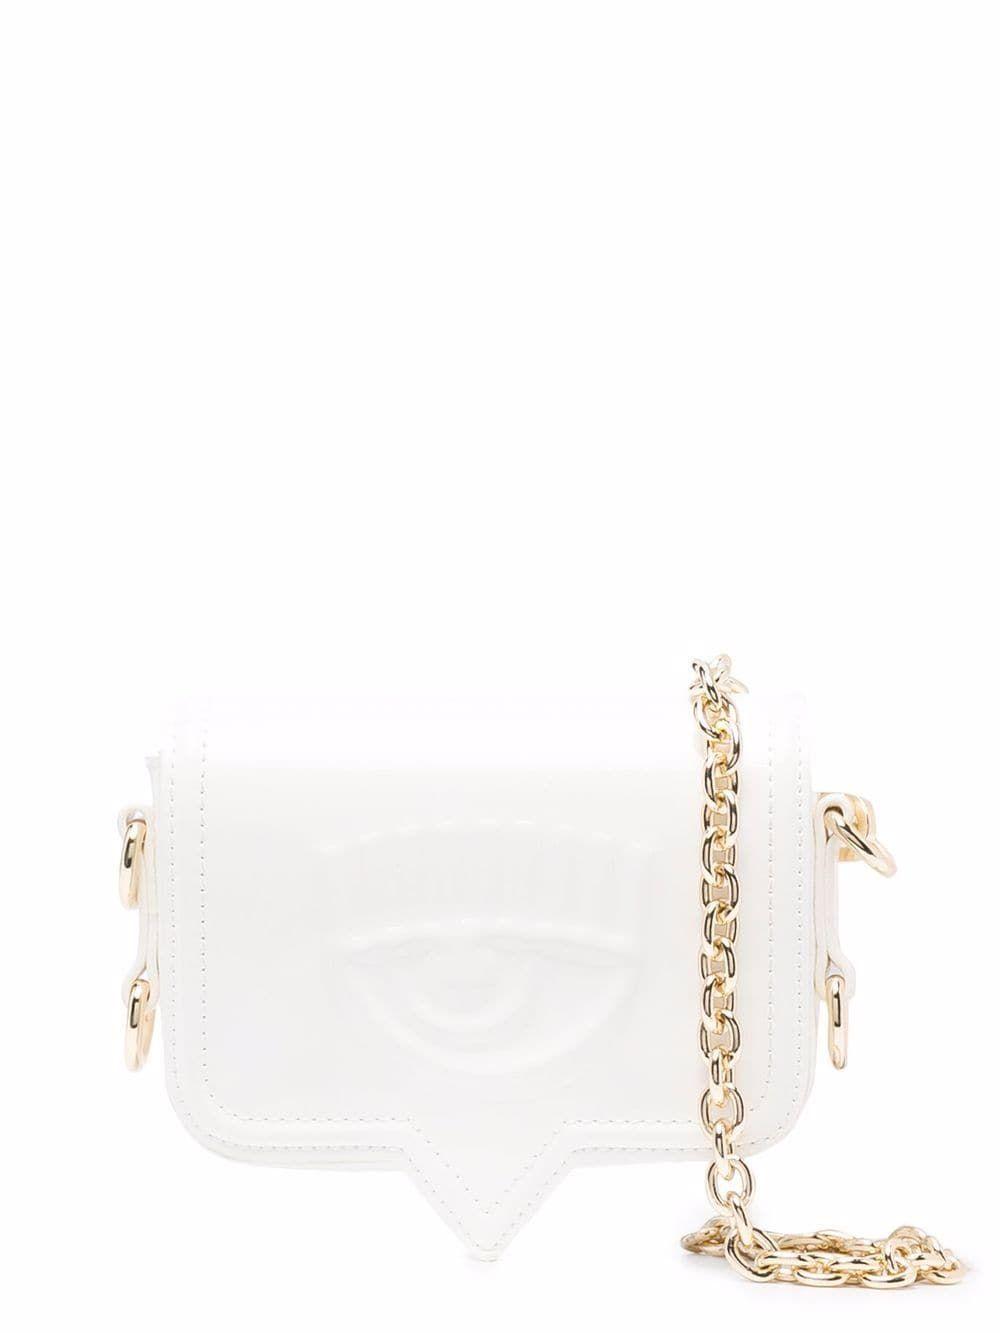 Chiara ferragni bags.. white